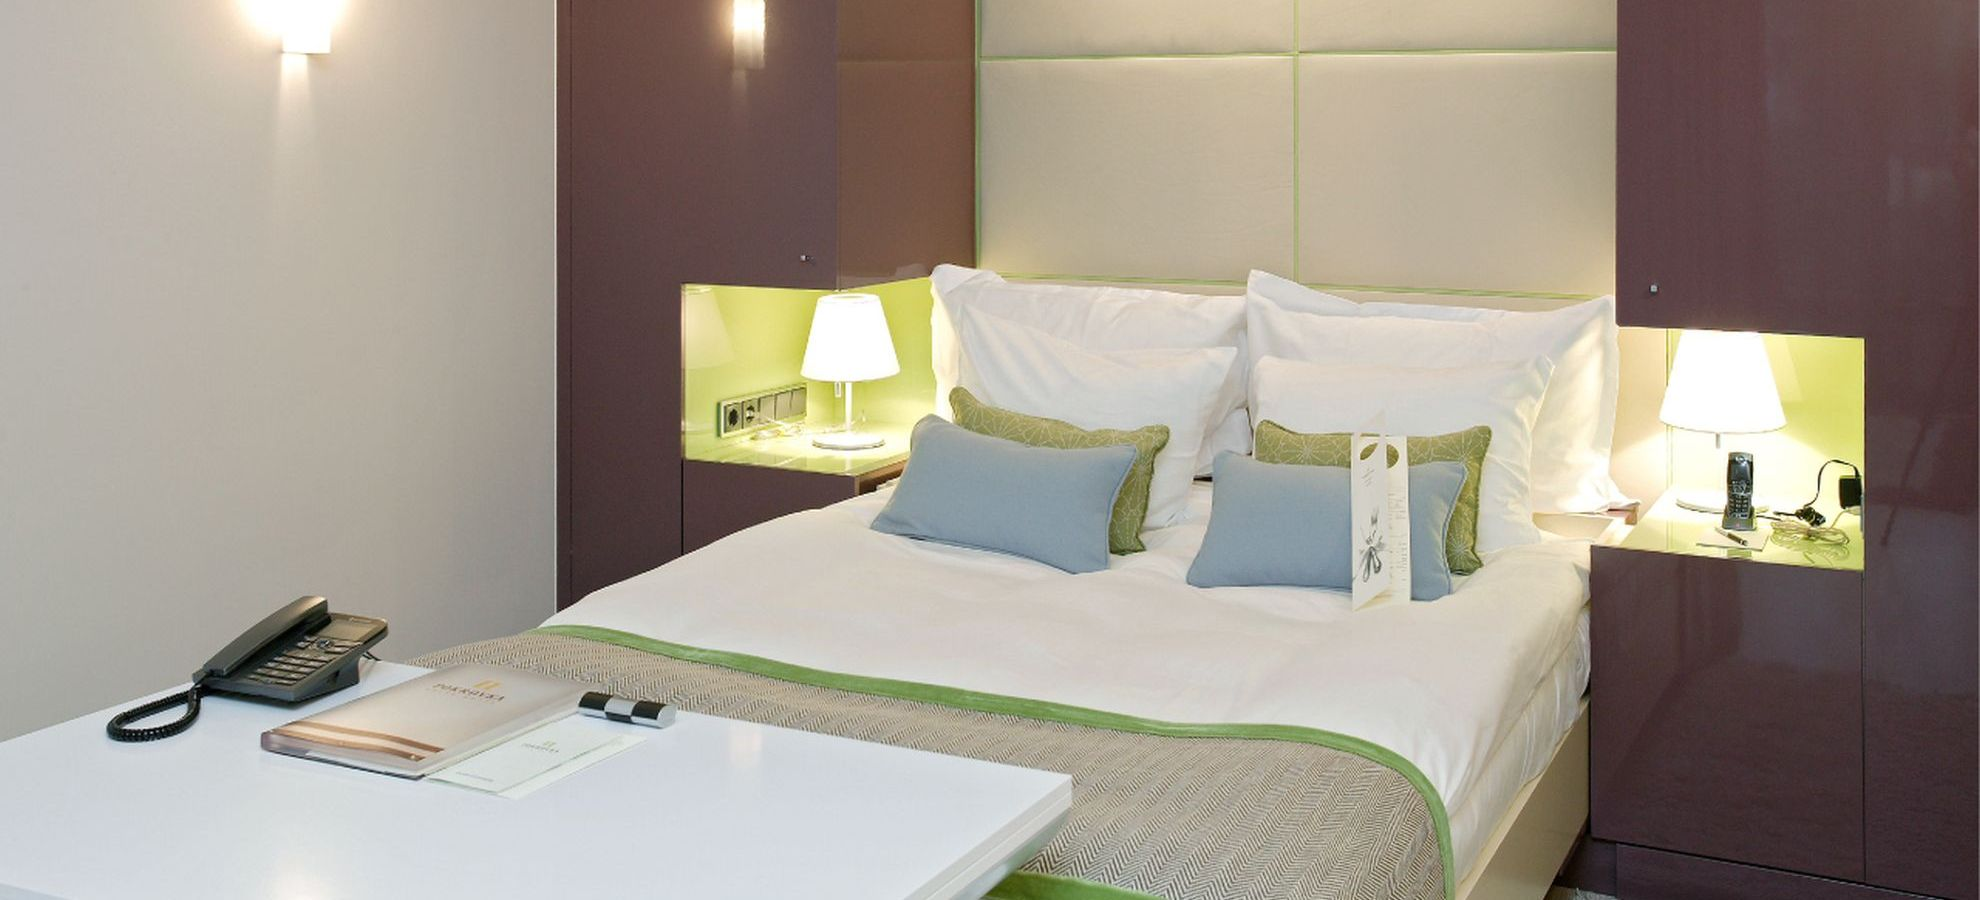 Mamaison-Hotel-Pokrovka-Junior-Suite-Bed.jpg